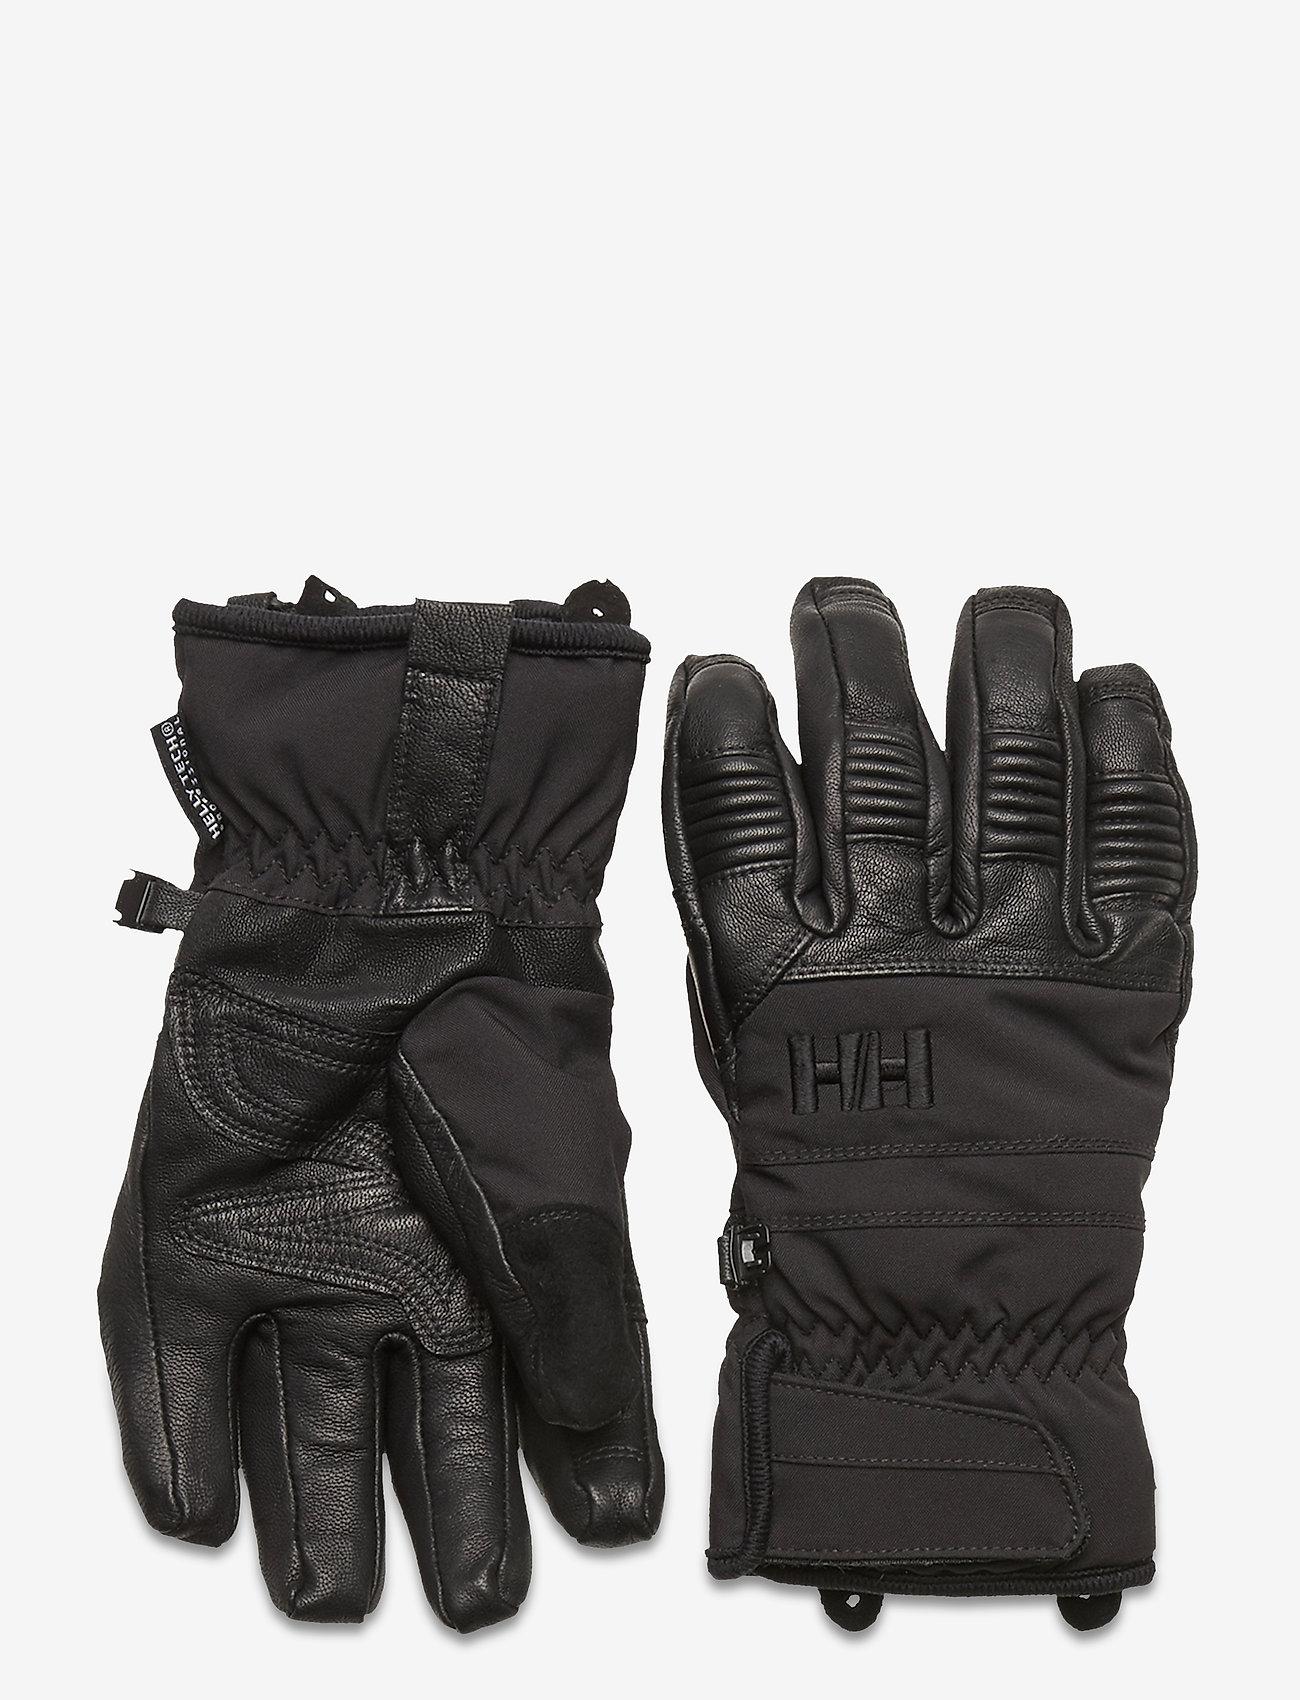 Helly Hansen - W LEATHER MIX GLOVE - accessoires - 990 black - 0